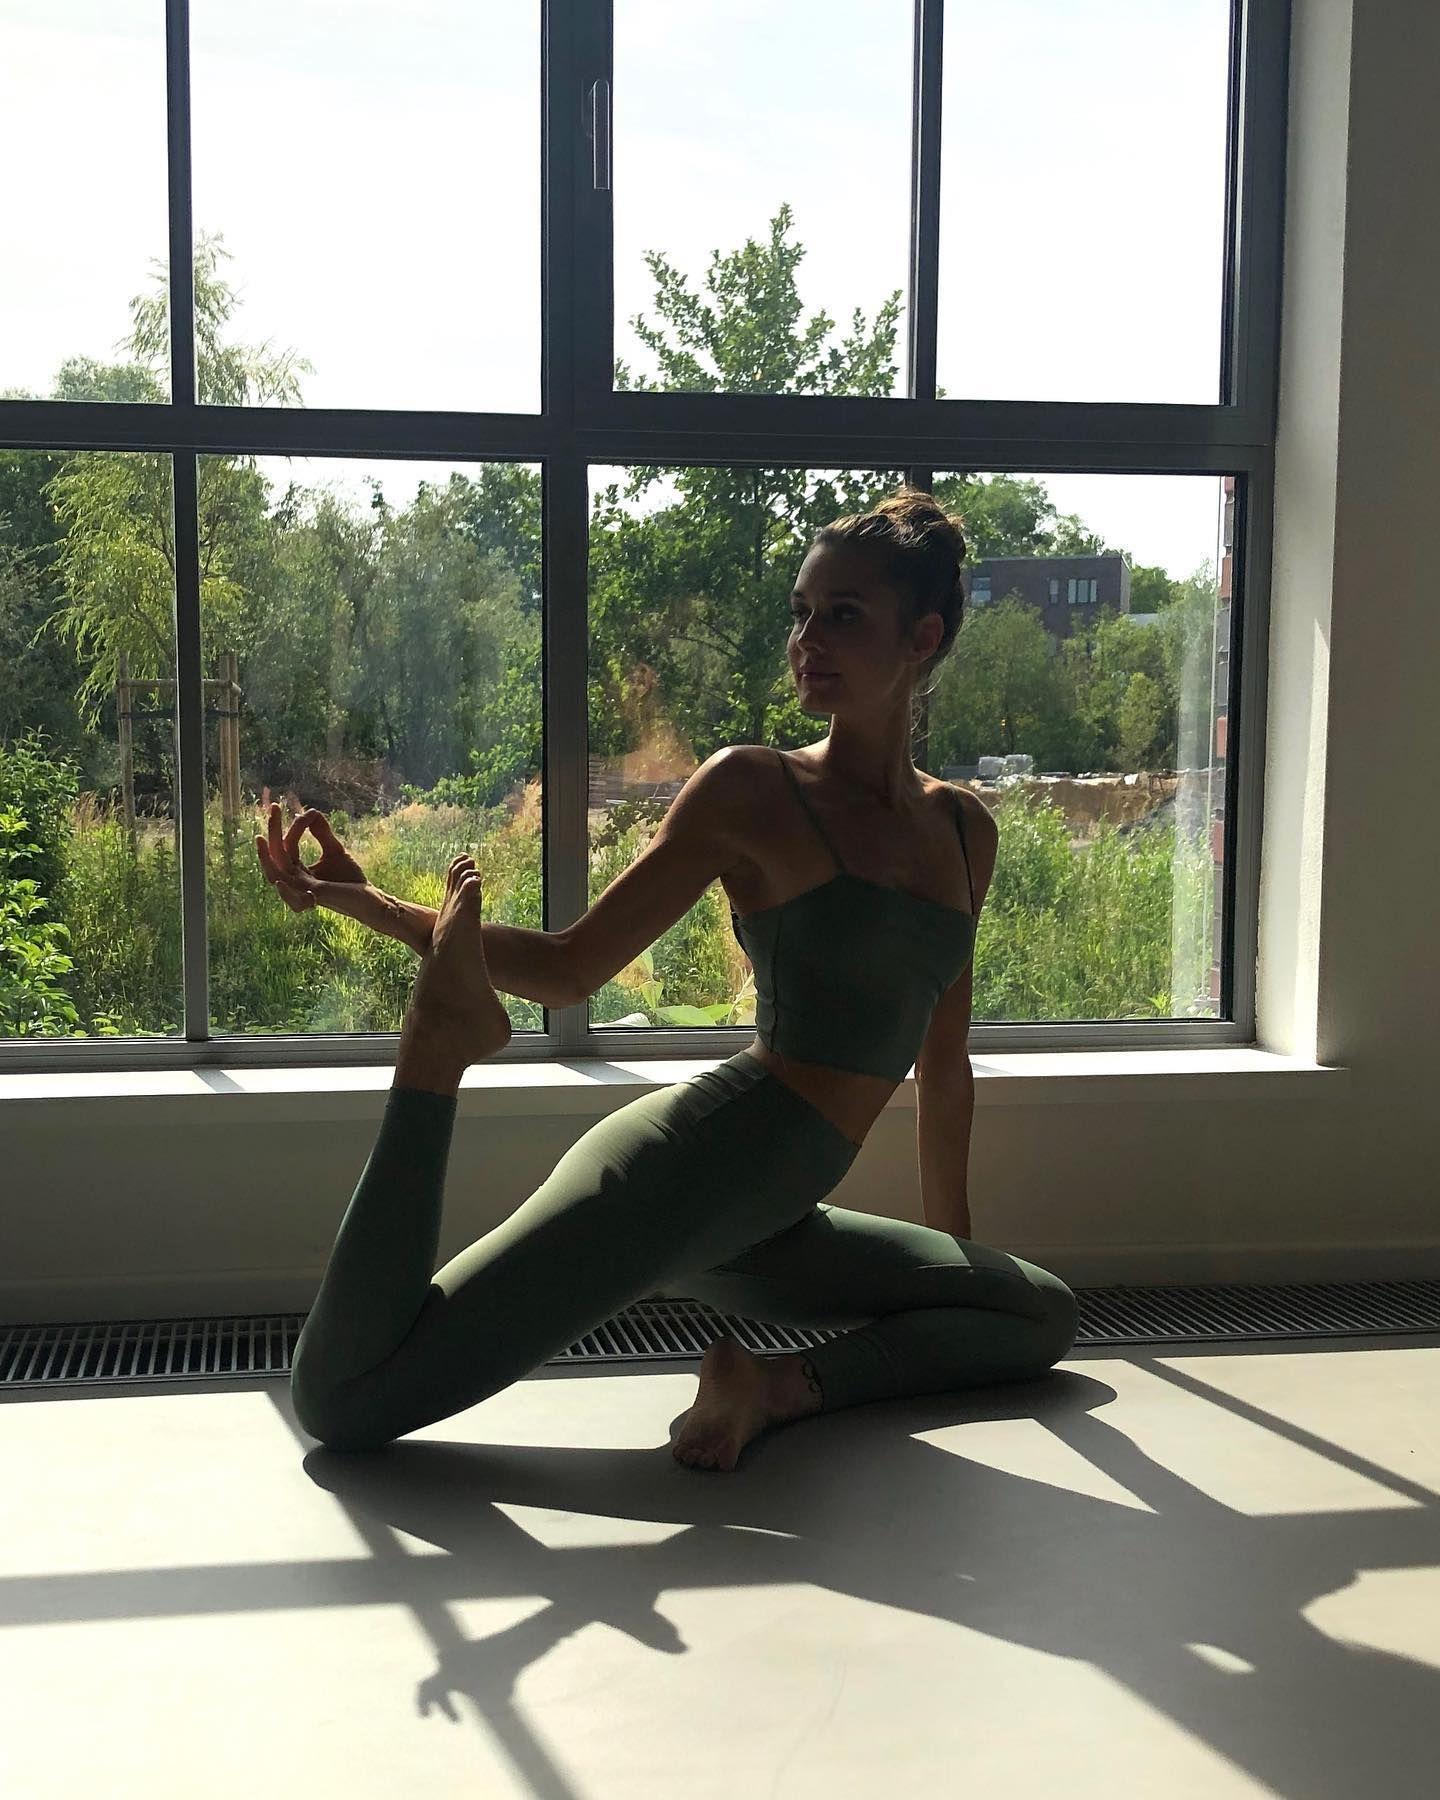 Our Fav Yoga Girl Antonianza In Our Earthy Sage Green Yoga Combo By Studio K Yogawear Studio Kolektif How To Do Pigeon Pos Yoga Girl Poses Pigeon Pose